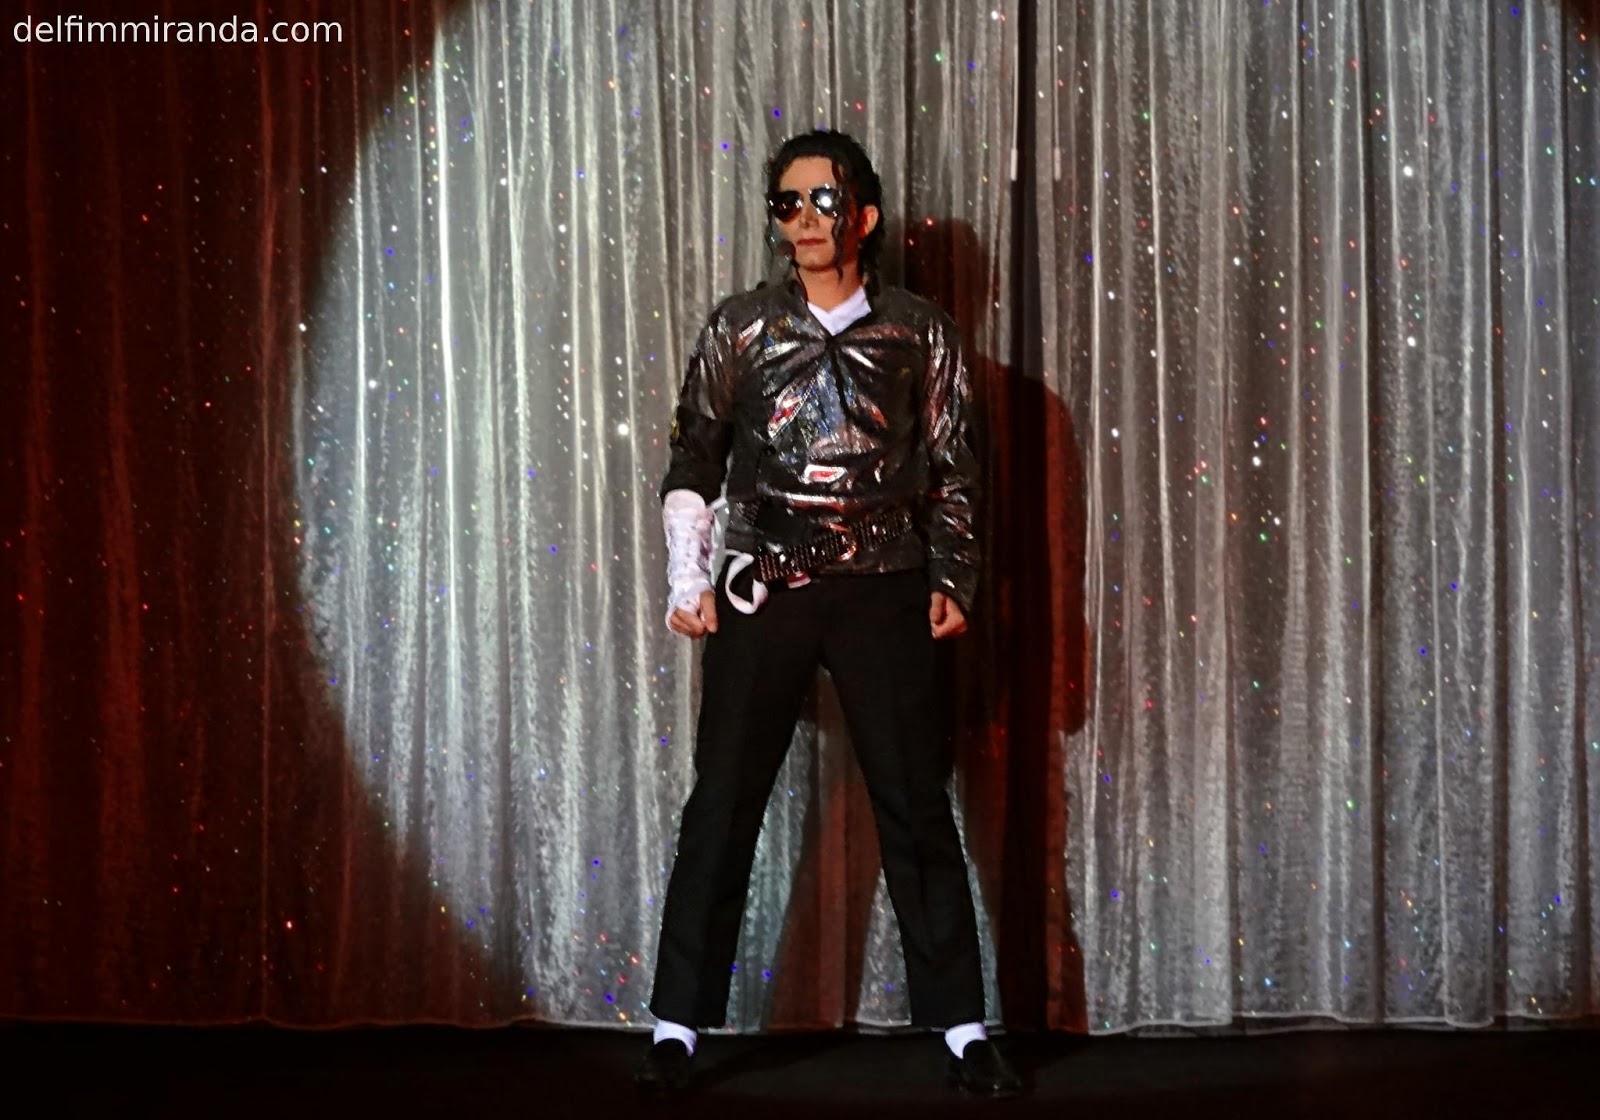 Delfim Miranda - Michael Jackson Tribute - Jam - Hotel Resident Show